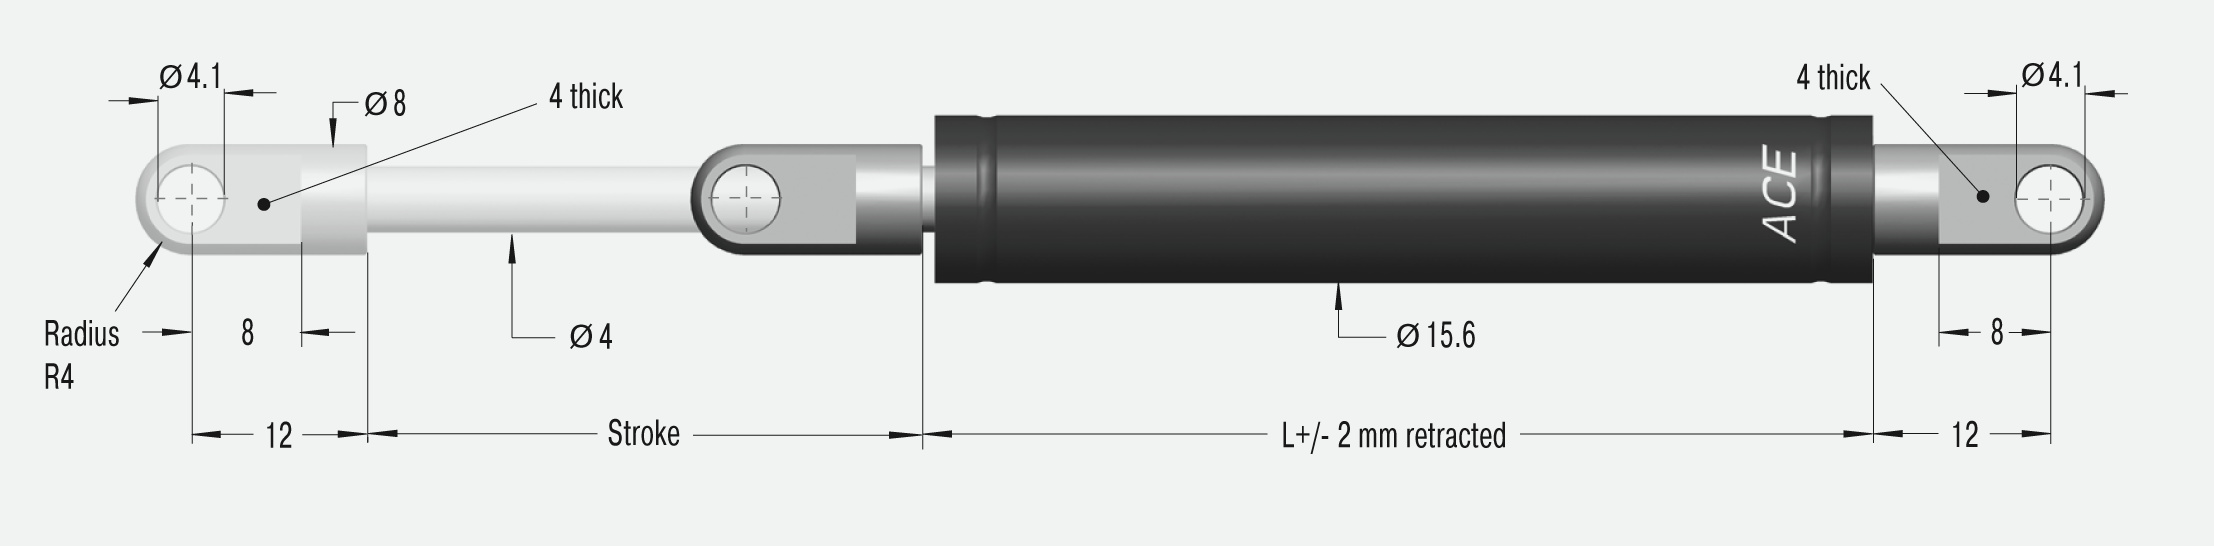 GZ-15-100